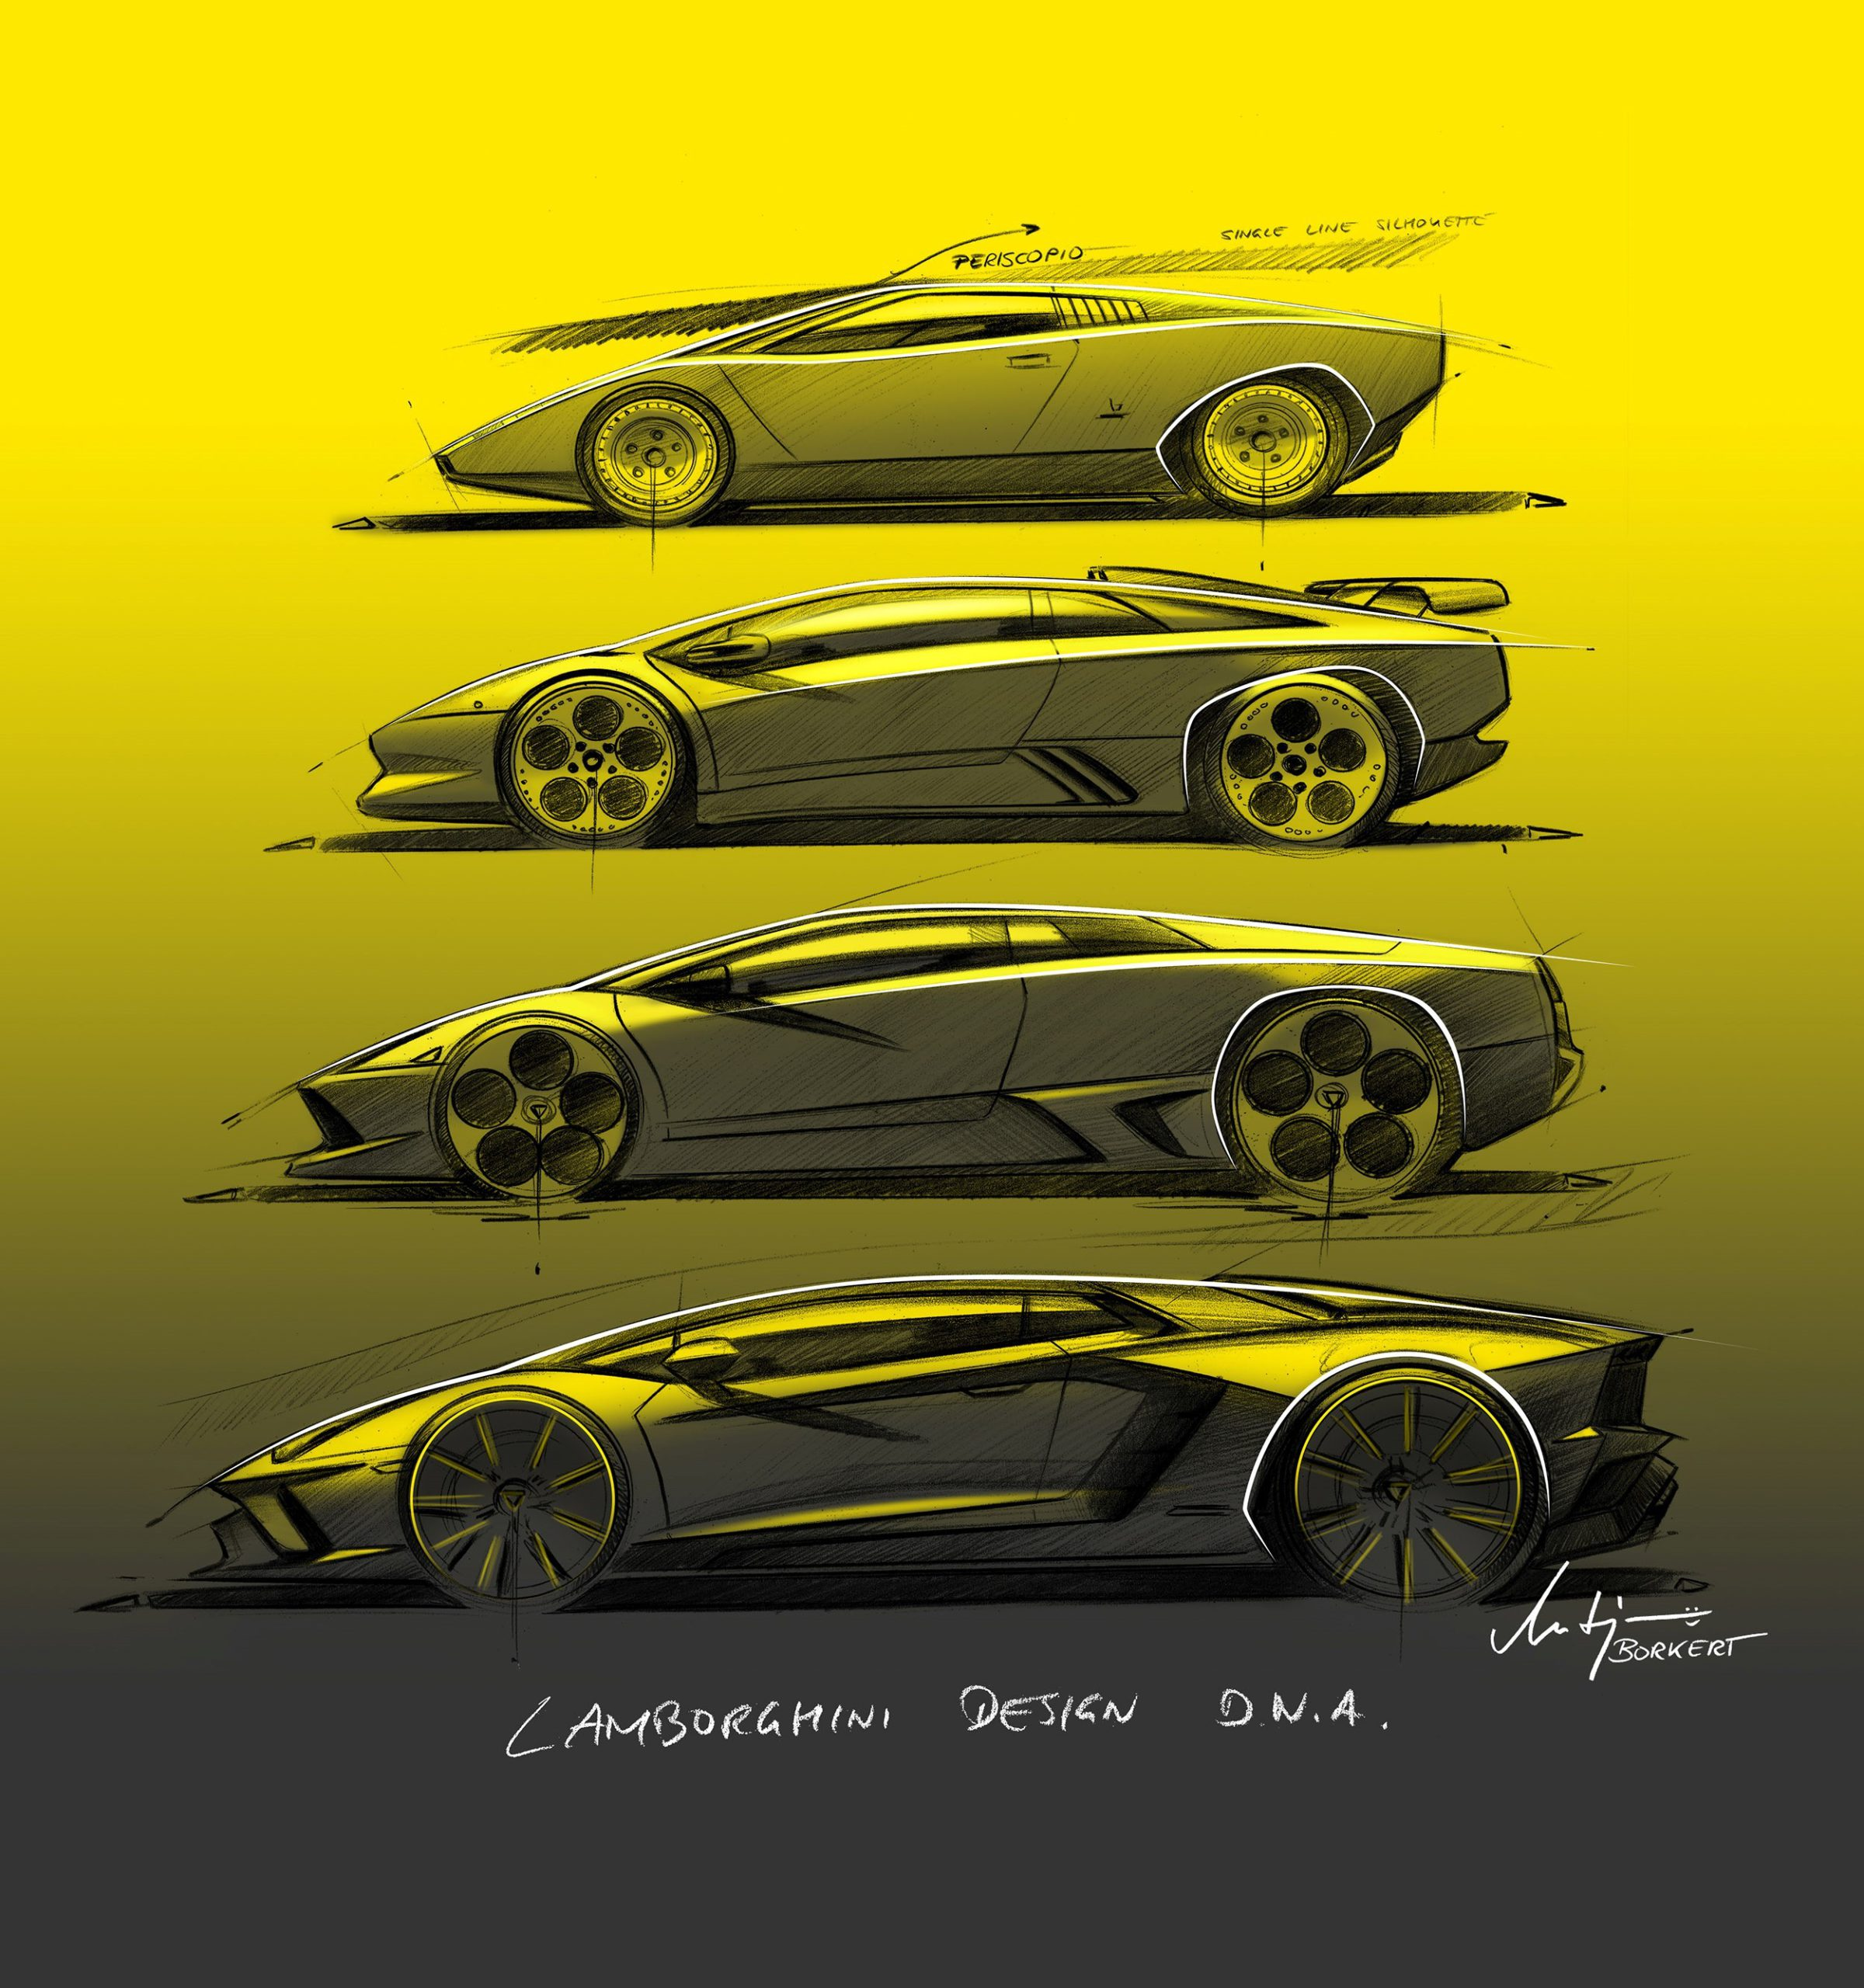 Lamborghini Design evolution